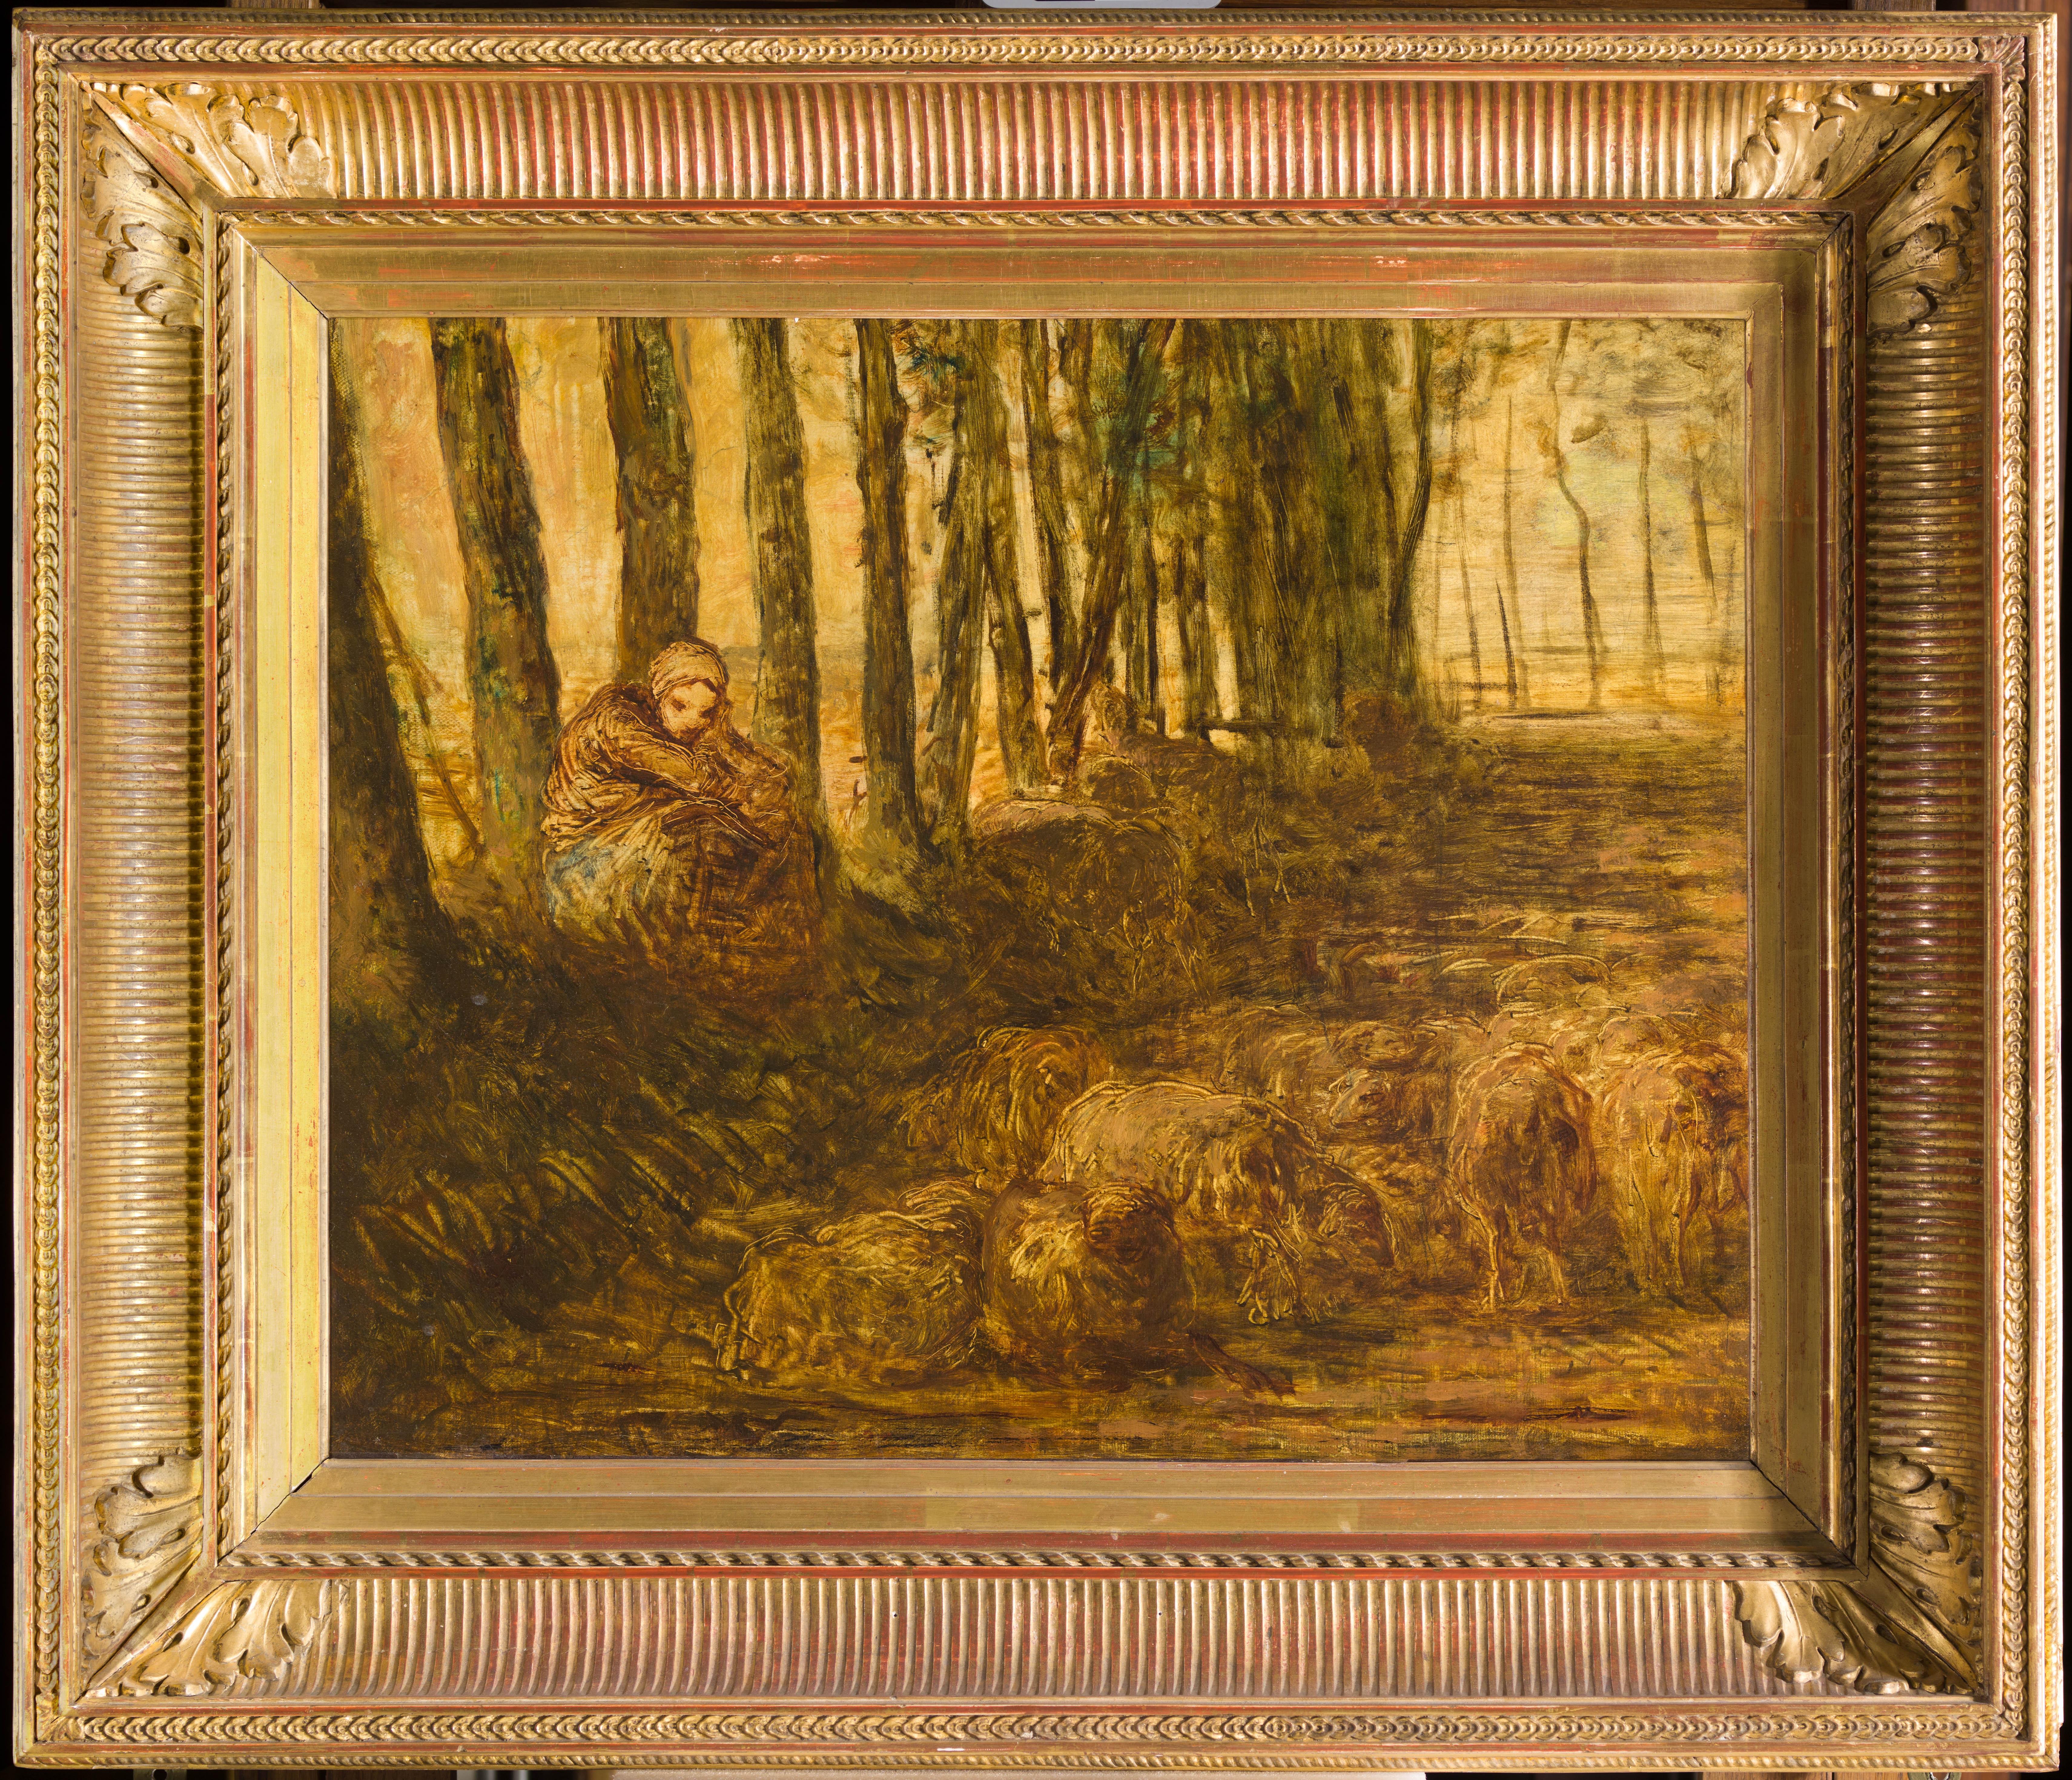 mnr/MNR00843/MNR843-copyright_Musee_d_Orsay_distribution_RMN-Grand_Palais_Patrice_Schmidt.jpg